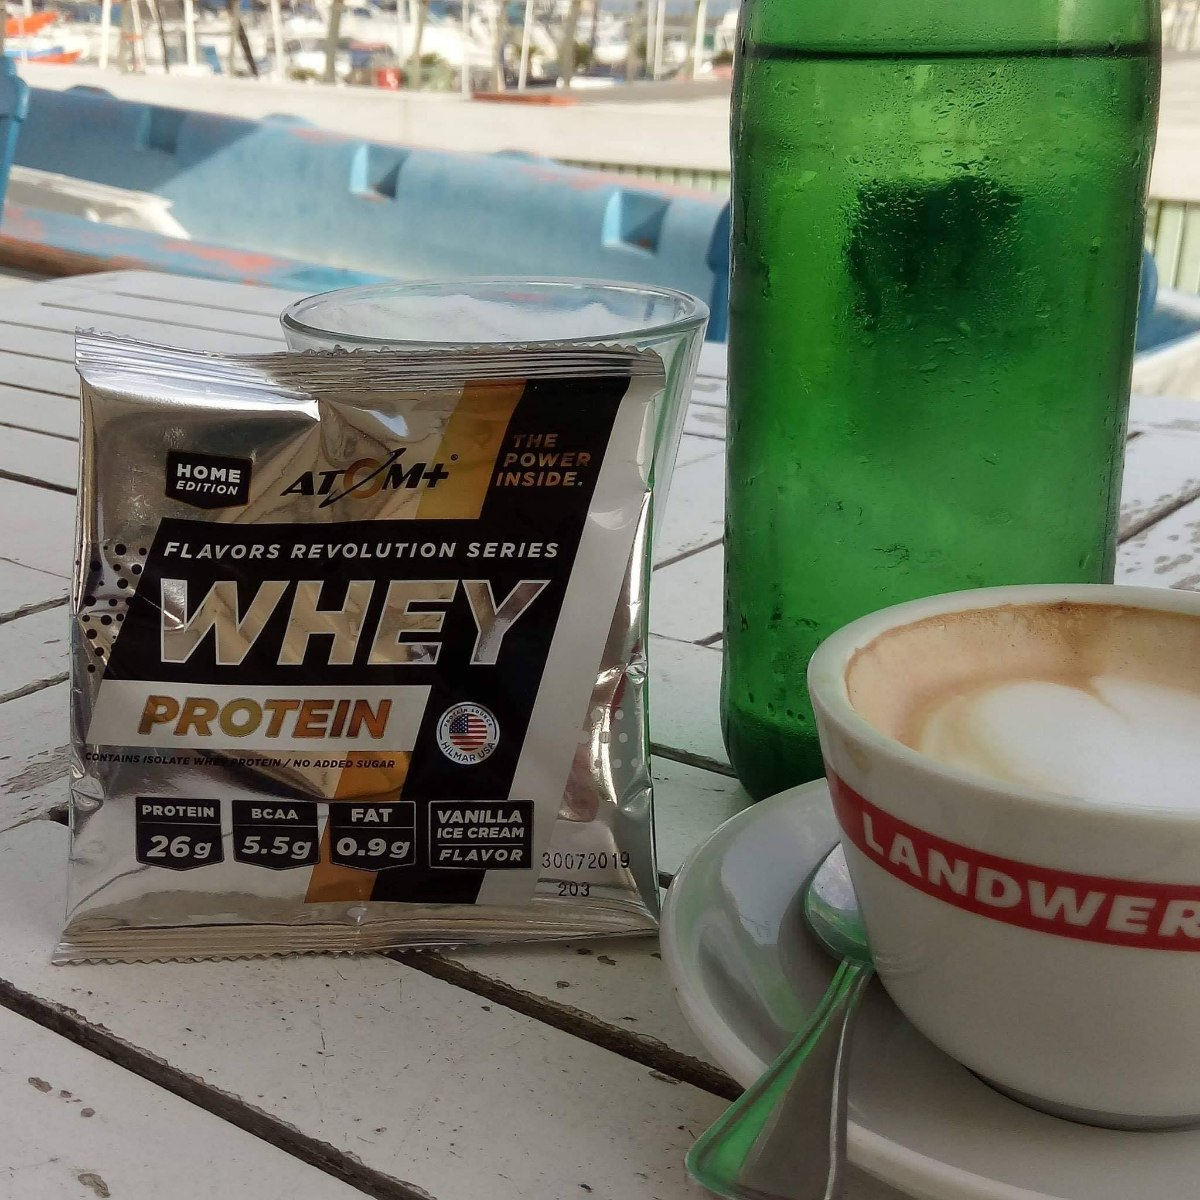 POP UP|מוגבל ל1 יח ללקוח מנת חלבון אייס קפה מבית ATOM+ במחיר היכרות מיוחד